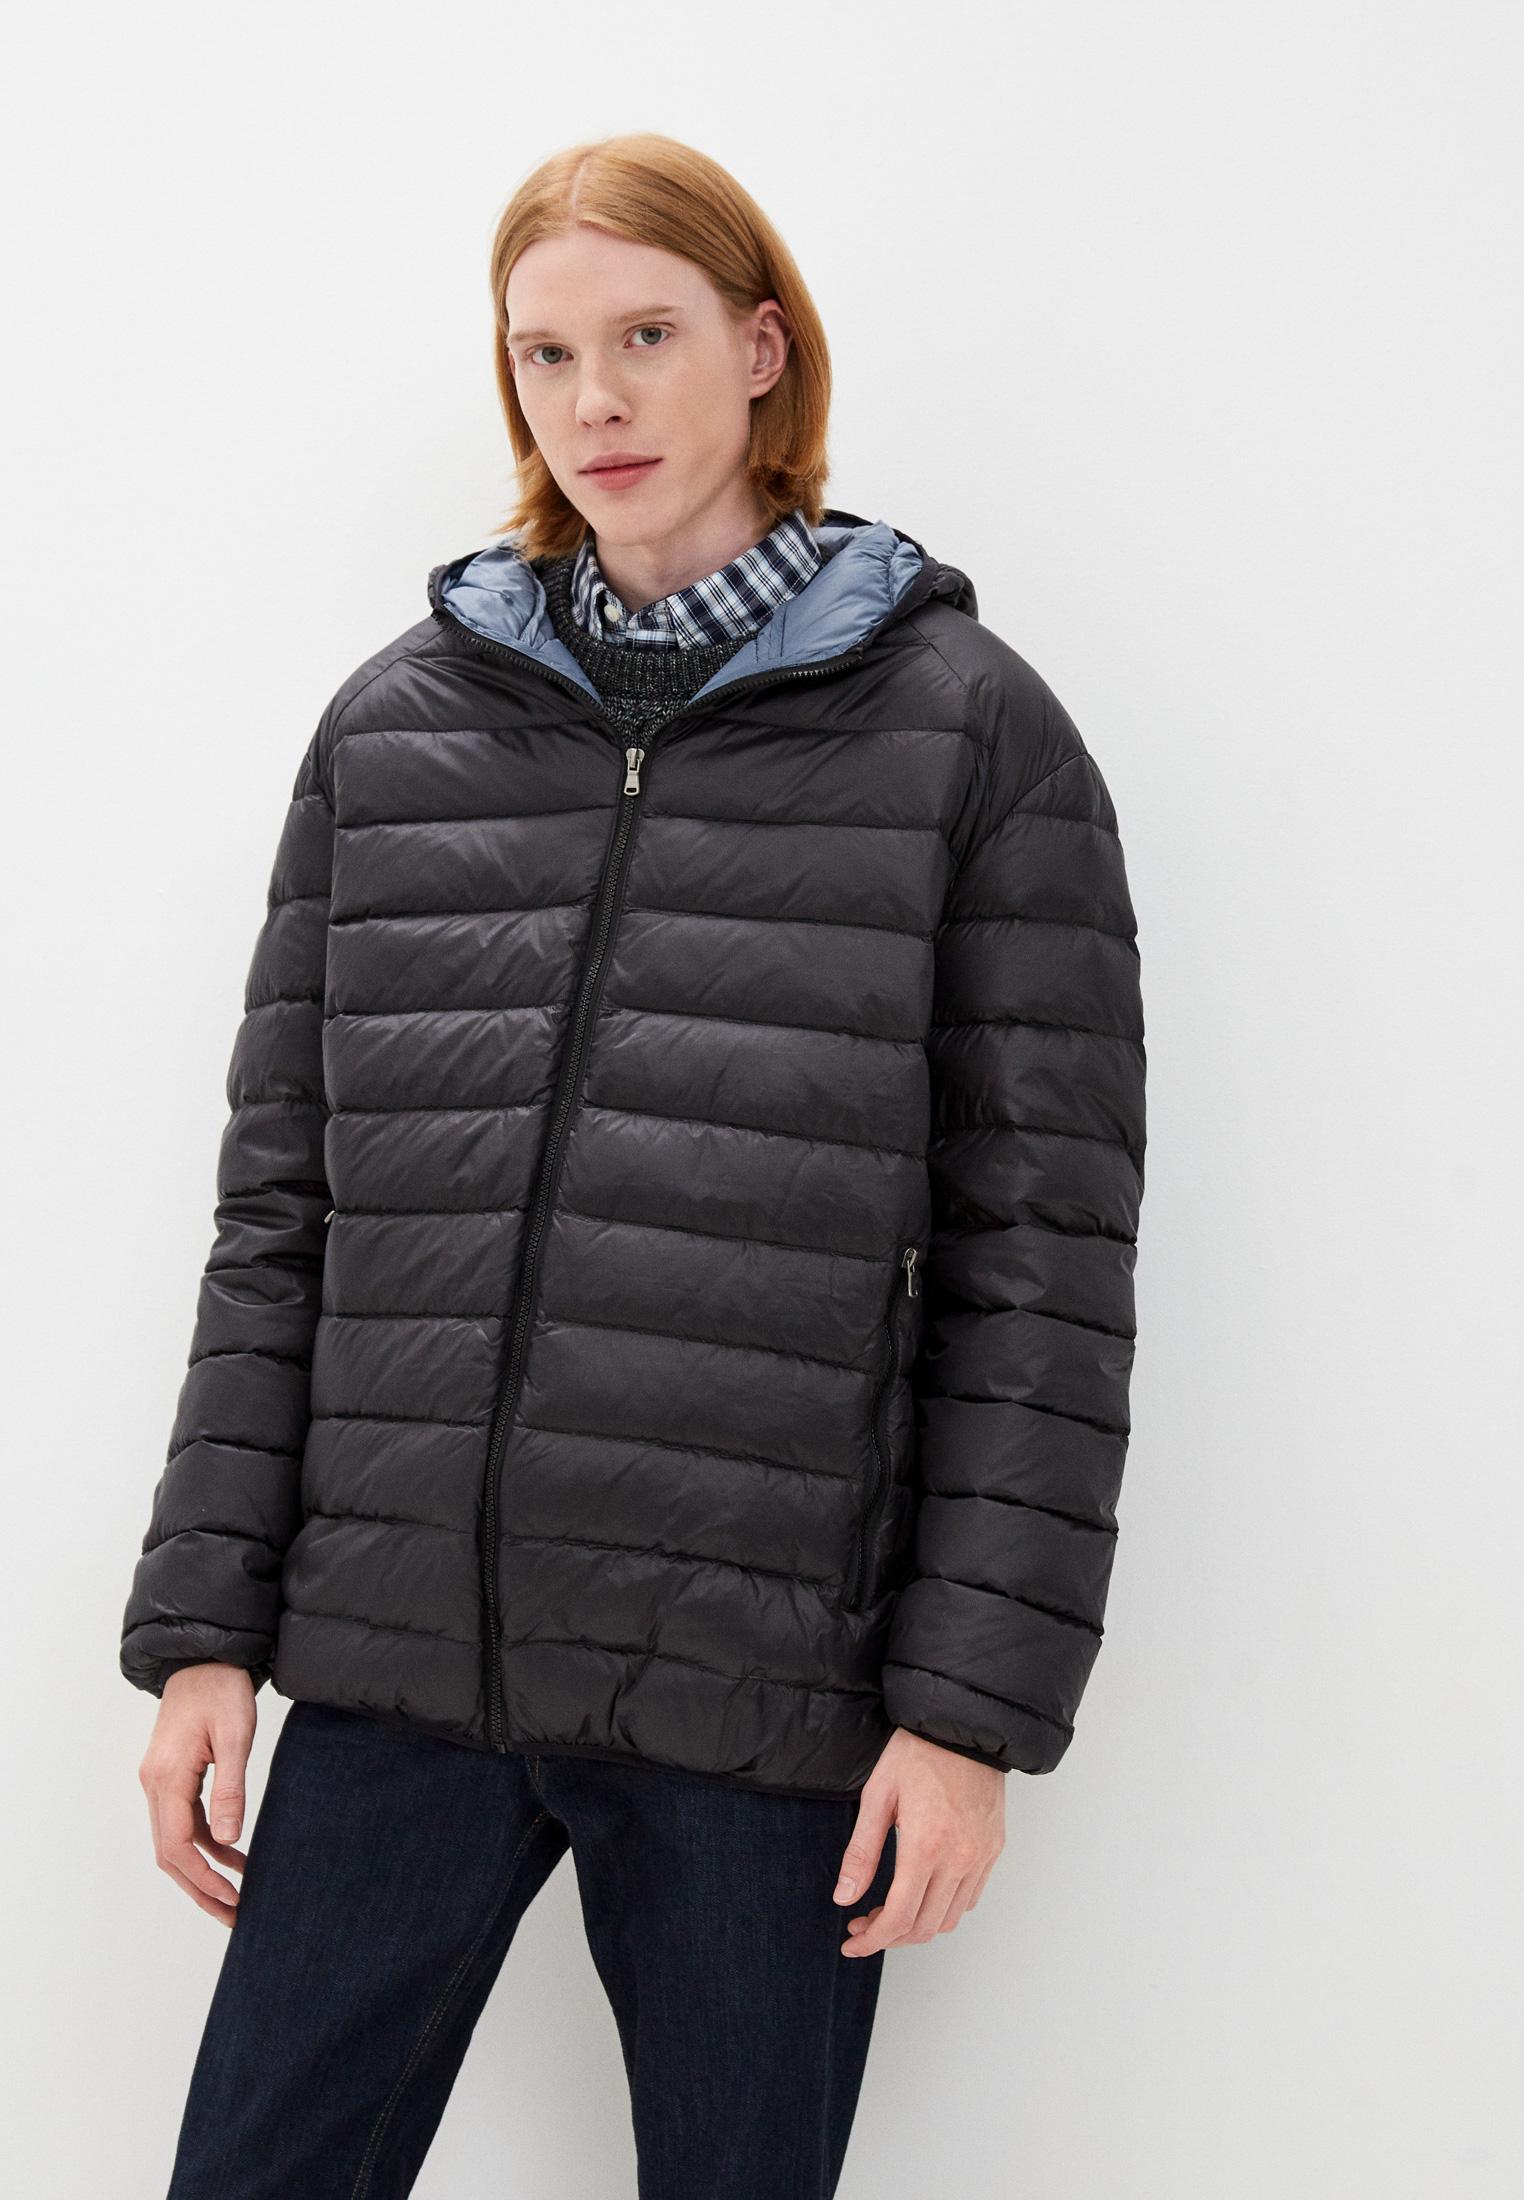 Утепленная куртка Maxfort Куртка утепленная Maxfort